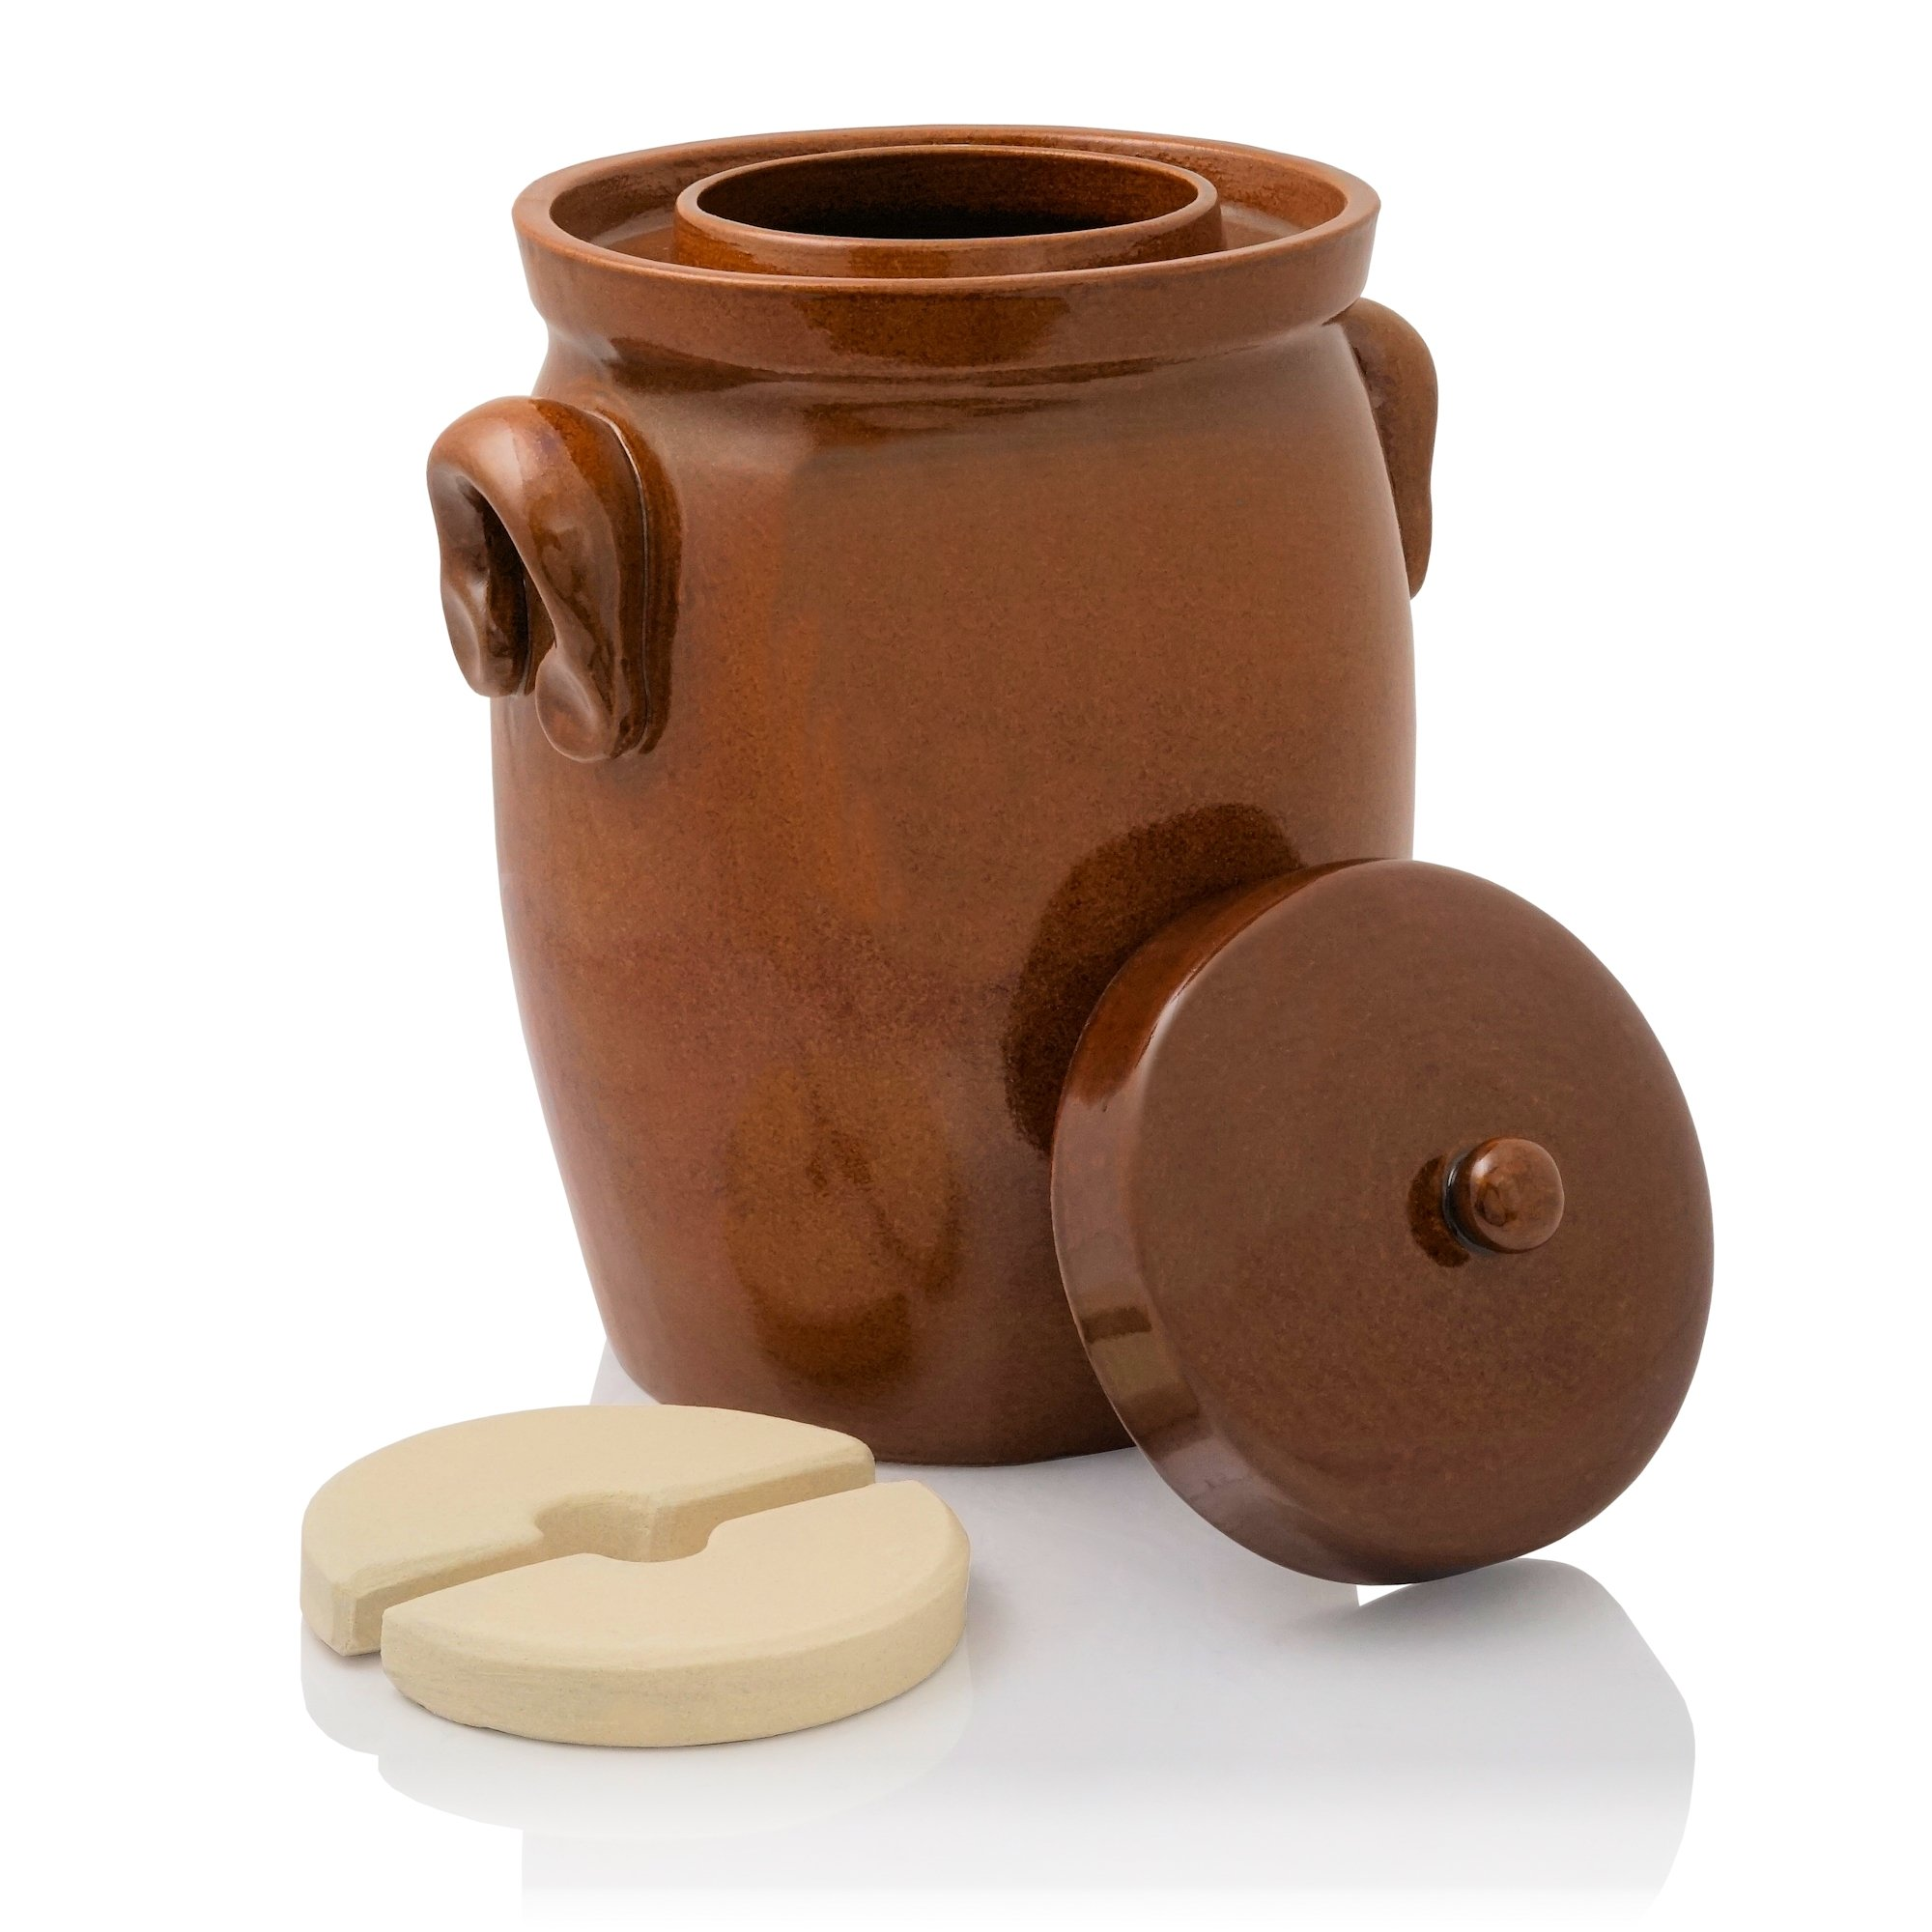 K&K German Fermenting Pot | brown | Fermentation Jar | Crock Pot | Made in Germany (5.0 Liter (1.3 Gal))